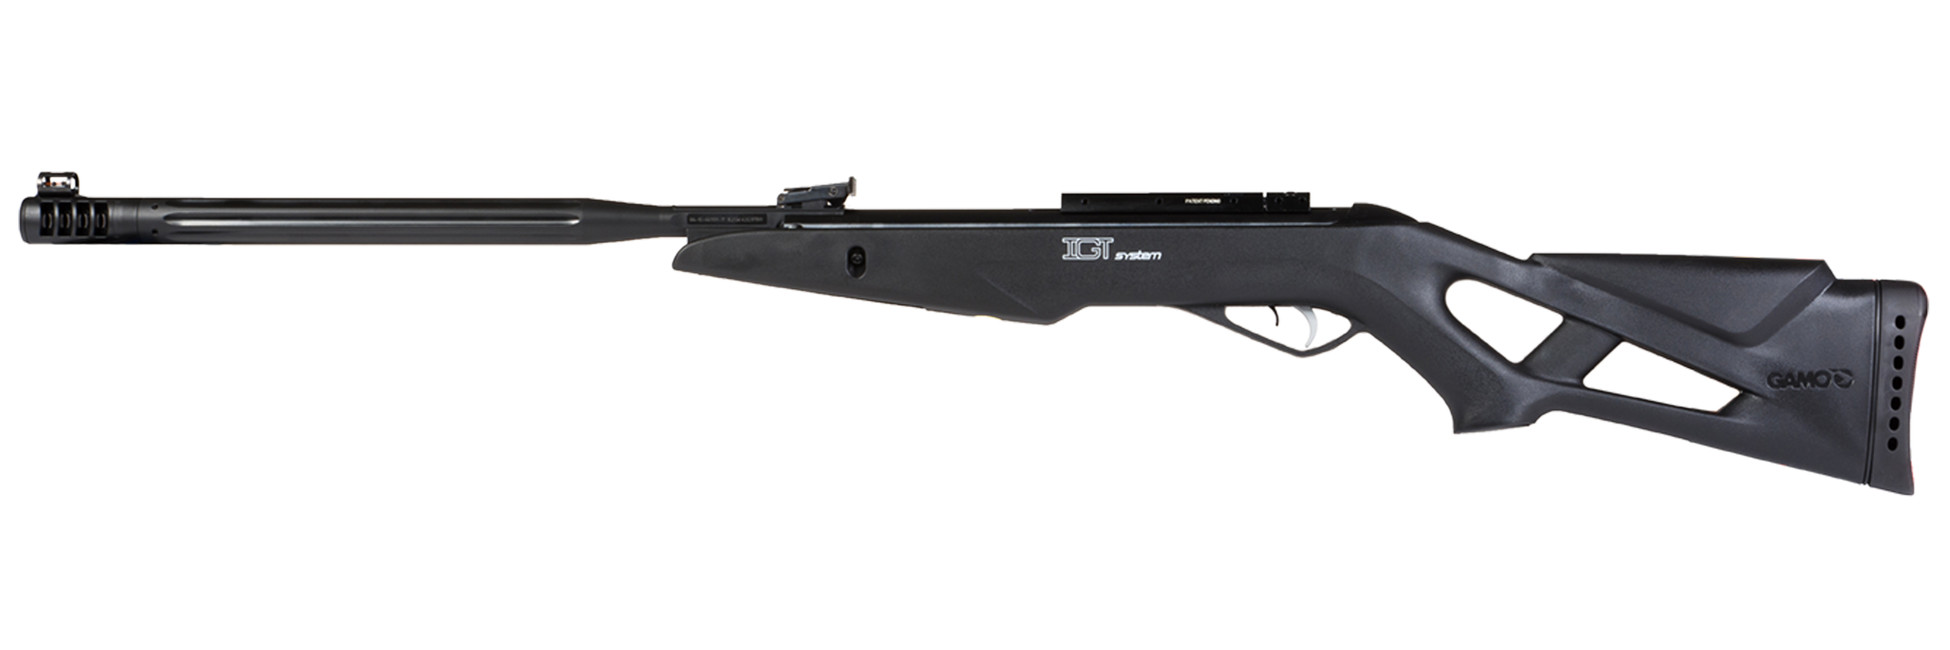 Pellets Air Gun Rifle Pistol Ammo Gamo Rocket 4,5 mm .177 150 pcs